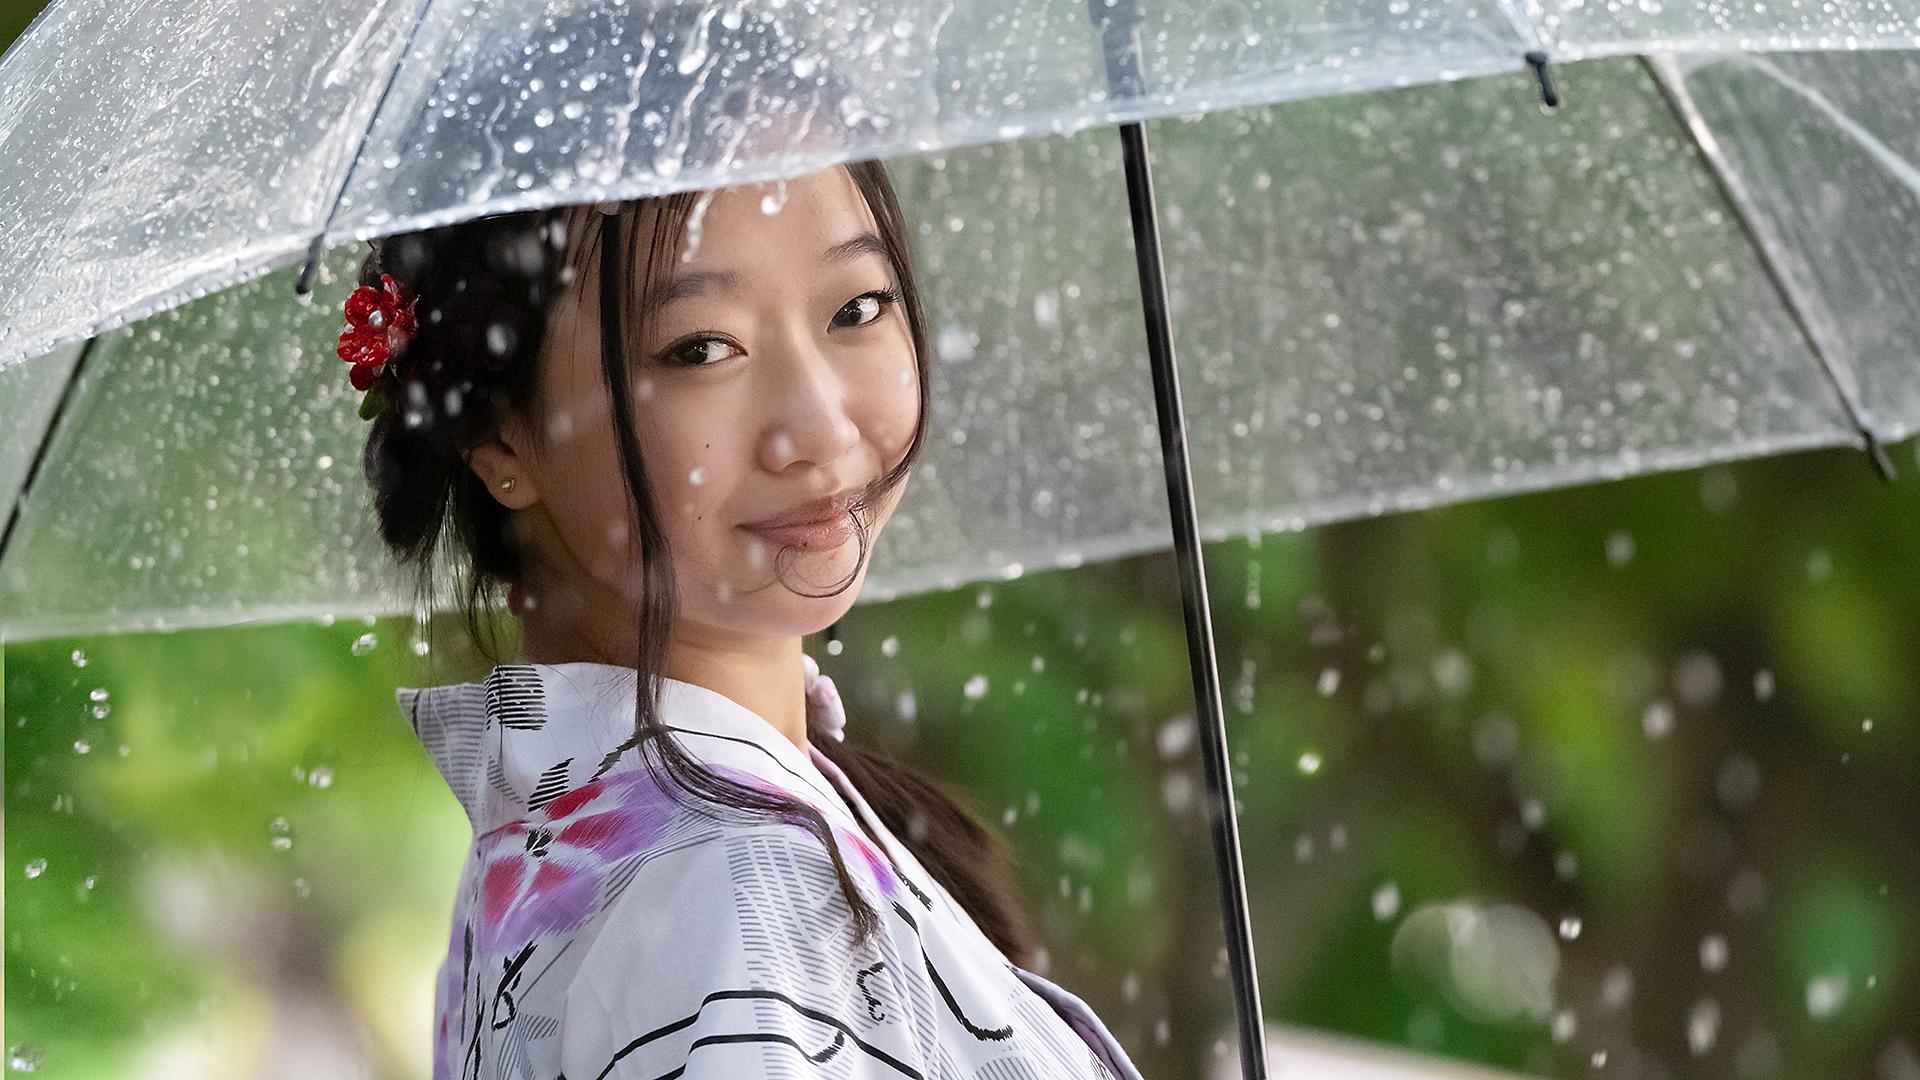 kimono, yukata, Japanese Kimono, Japanese Attire, Sweet Sixteen Portraits, Los Angeles Photographer, On Location Photography, Shichi Go San, 753, Japanese Room, Seven Five Three, Best Friend,